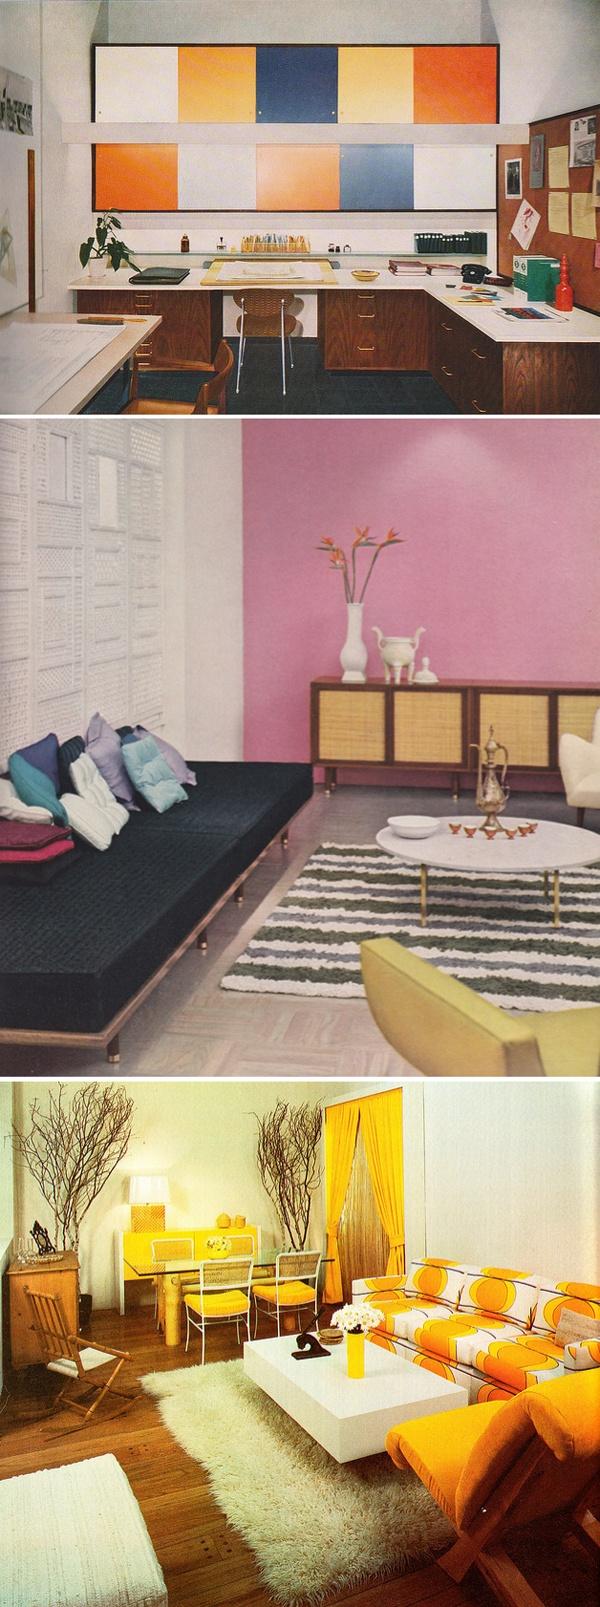 83 best vintage retro homes images on pinterest 1950s bathroom retro rooms all of these rooms look amazing retro interior designretro